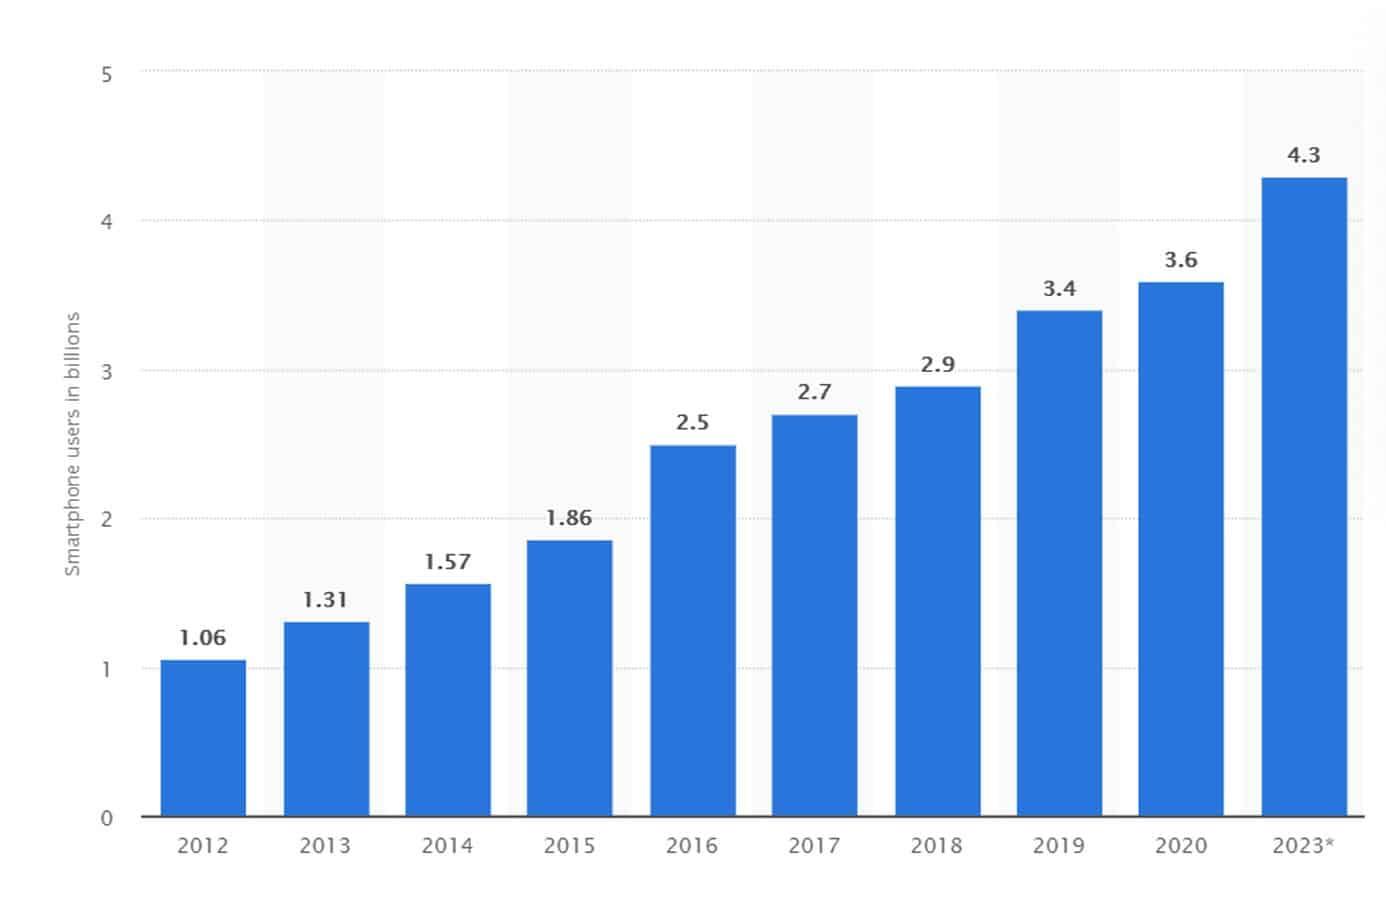 Smartphone users in billions